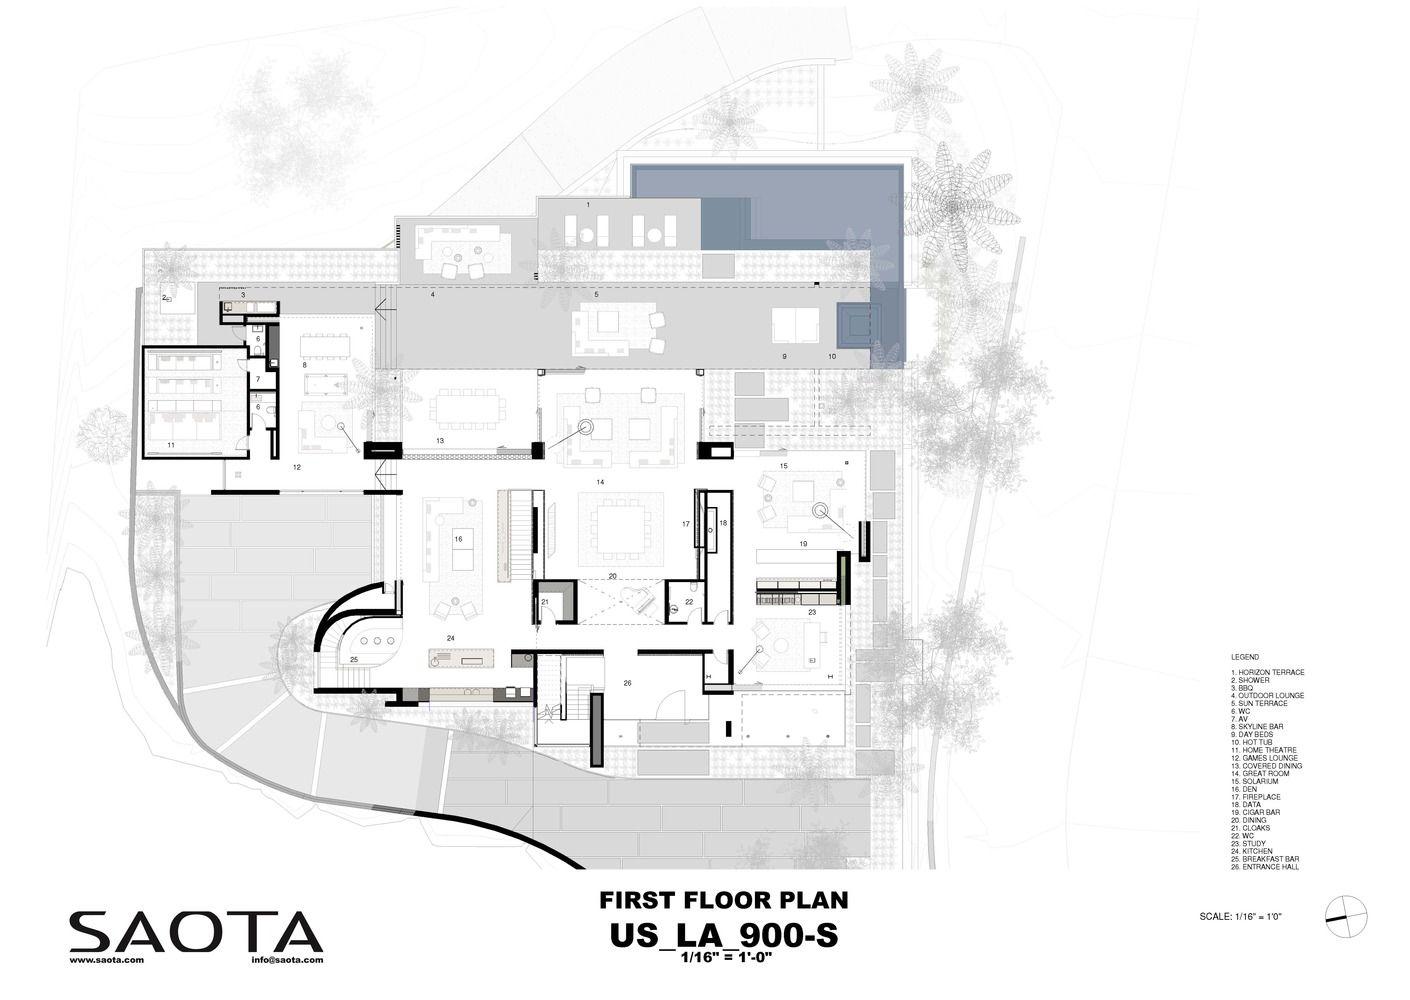 Gallery Of Stradella Saota 17 Floor Plans How To Plan Beautiful Houses Interior